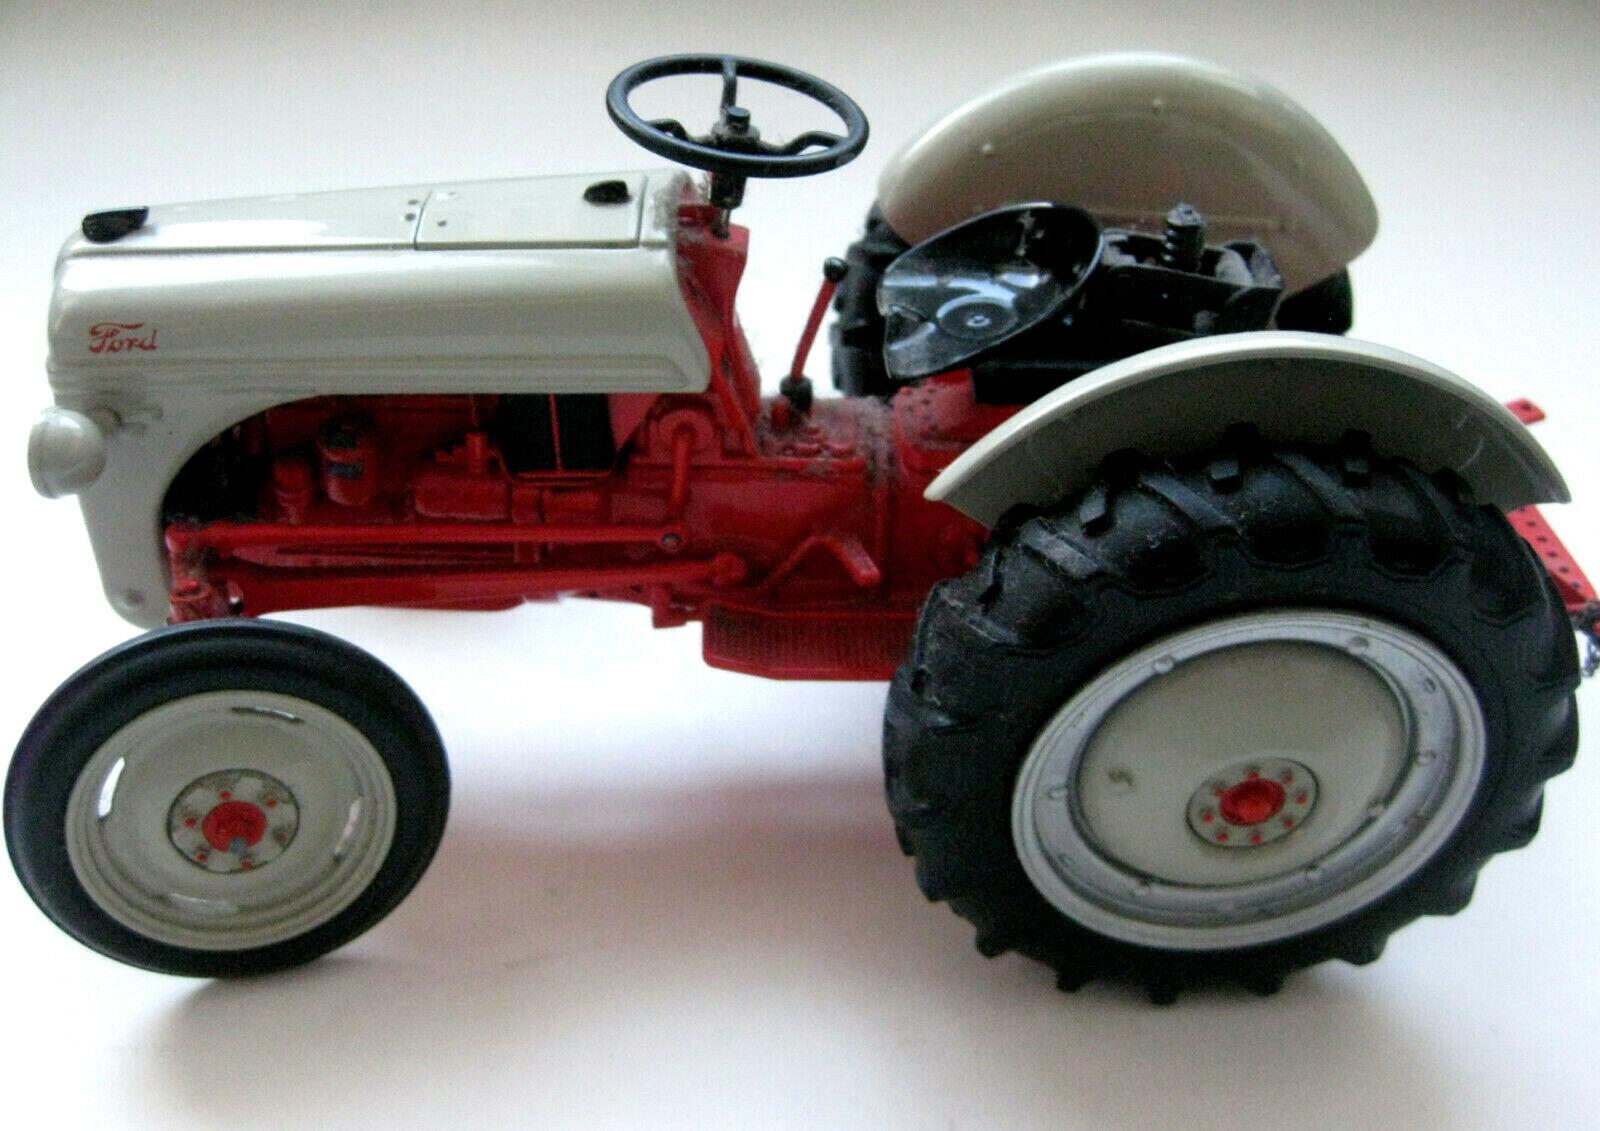 Vintage Ertl Ford Tractor Tractor Tractor - 2326U 0eb425